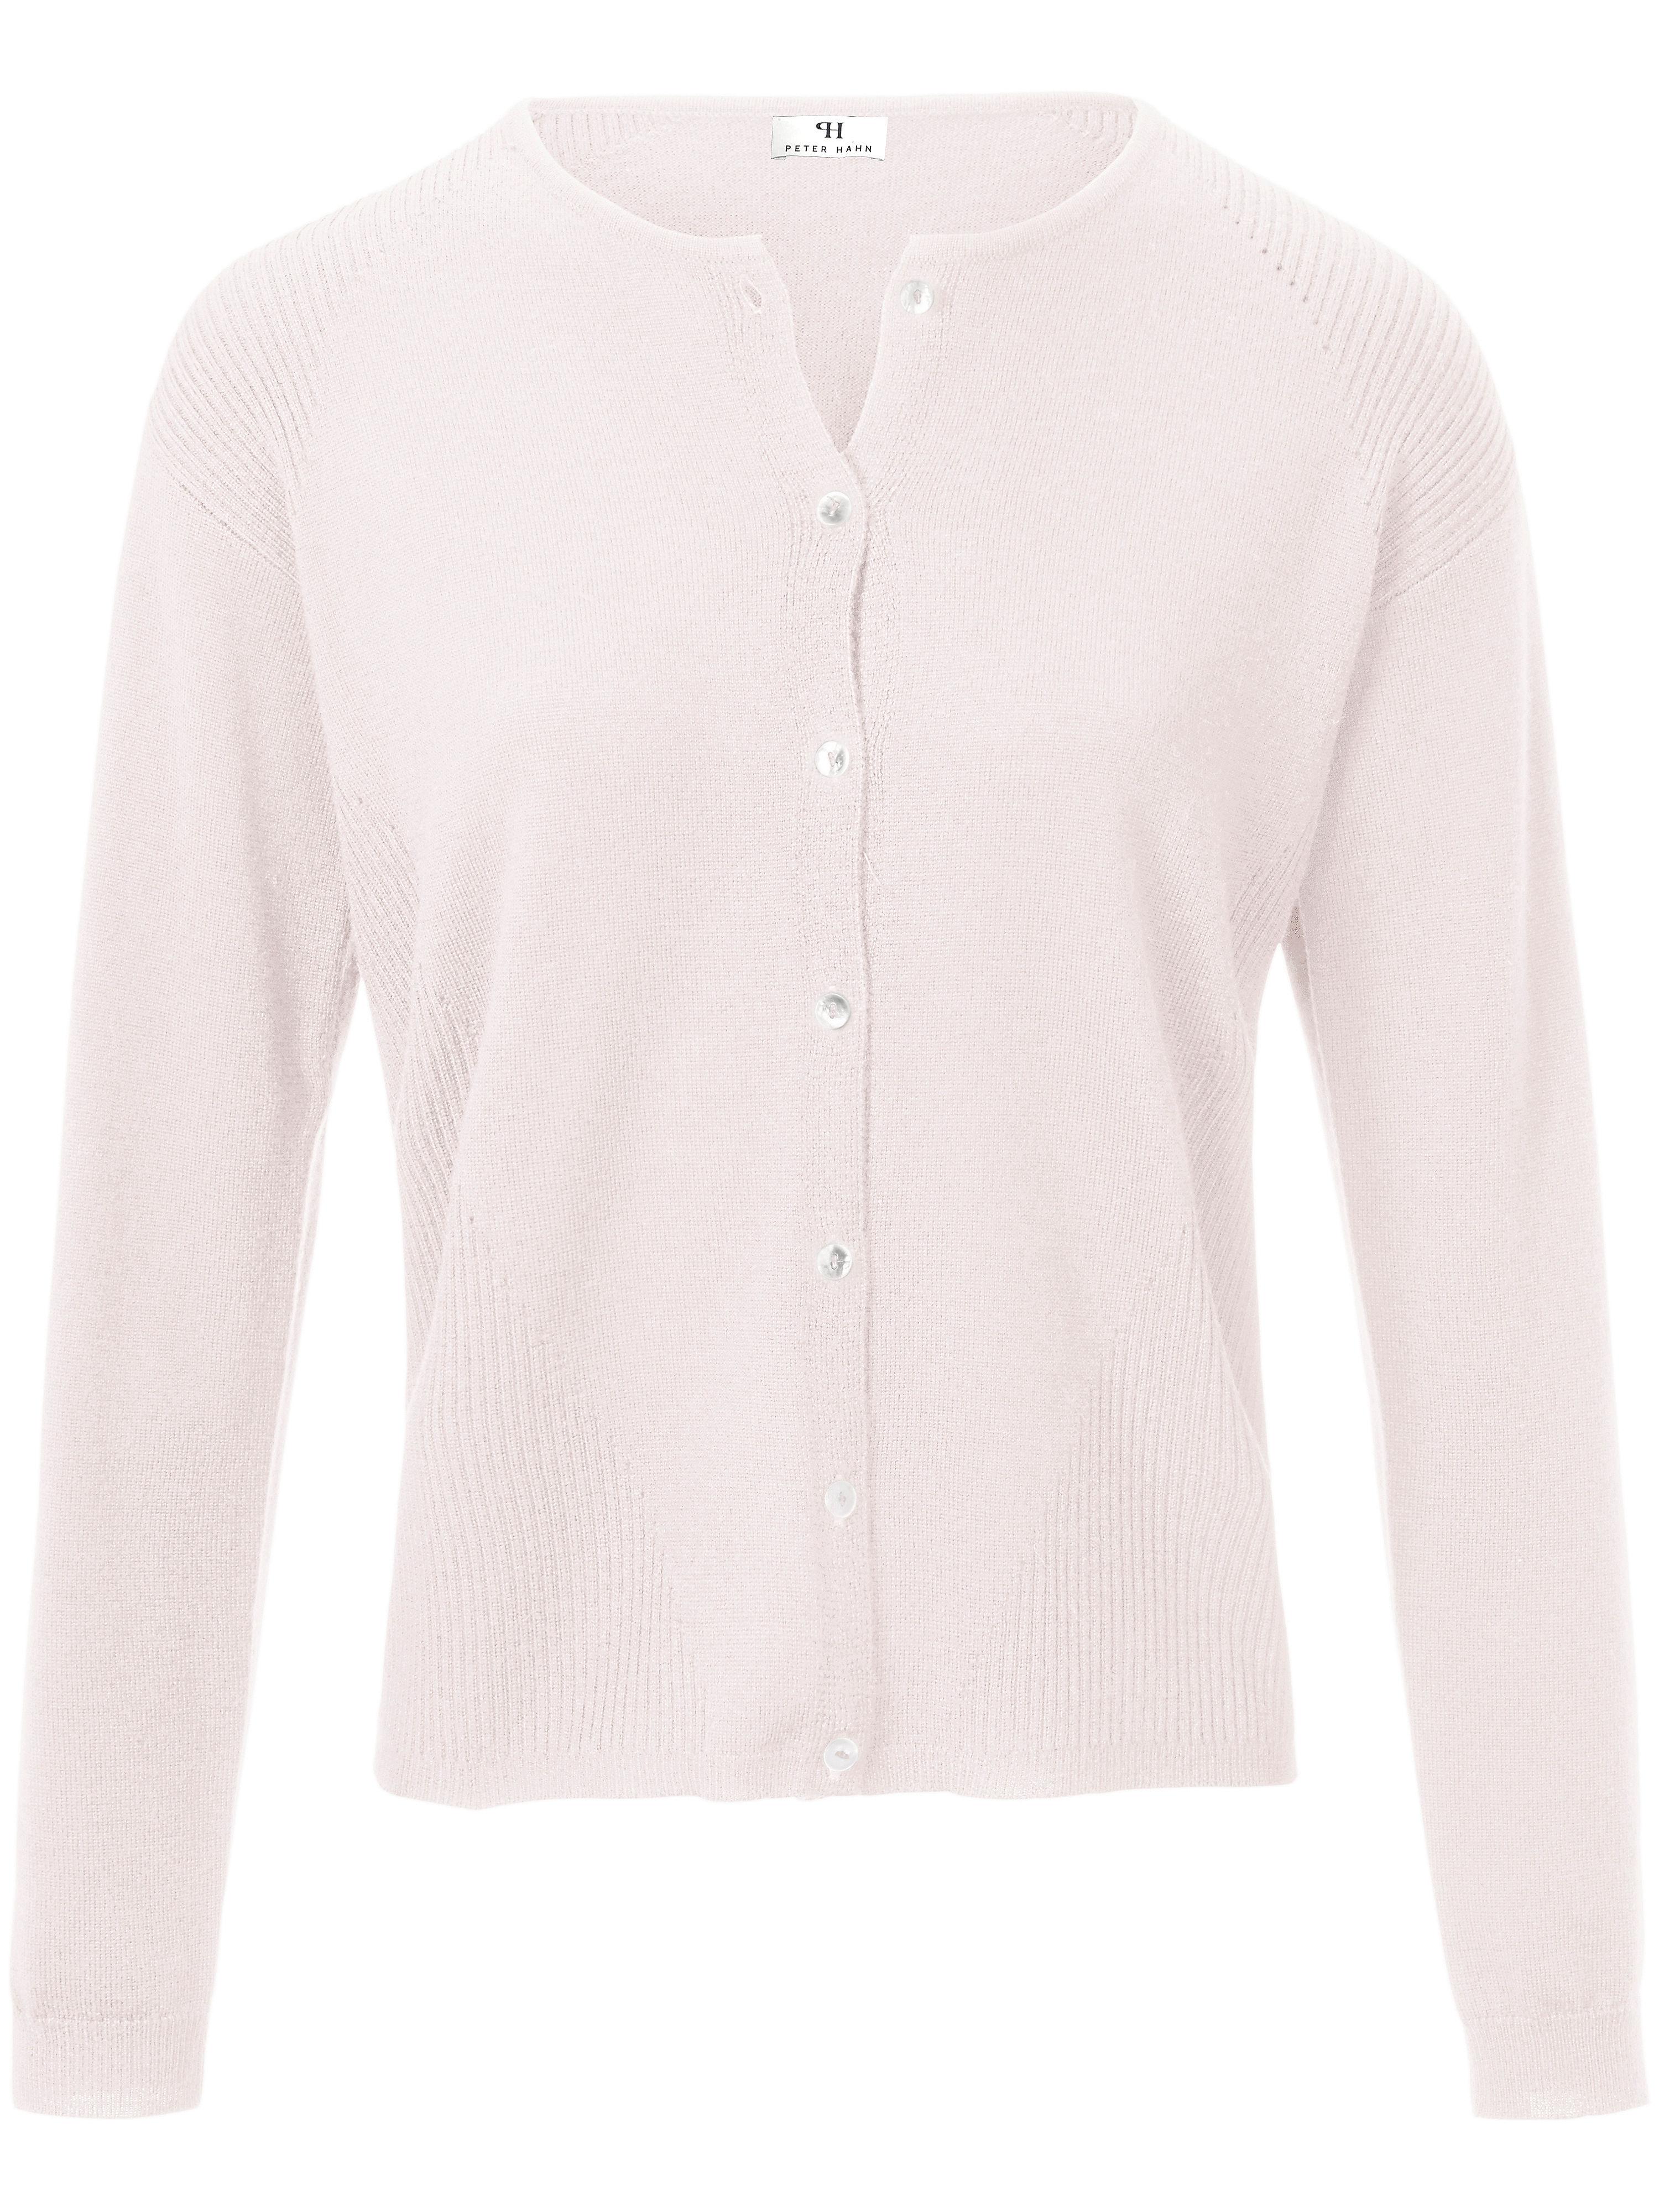 Image of   Cardigan 100% ren ny uld Fra Peter Hahn rosé